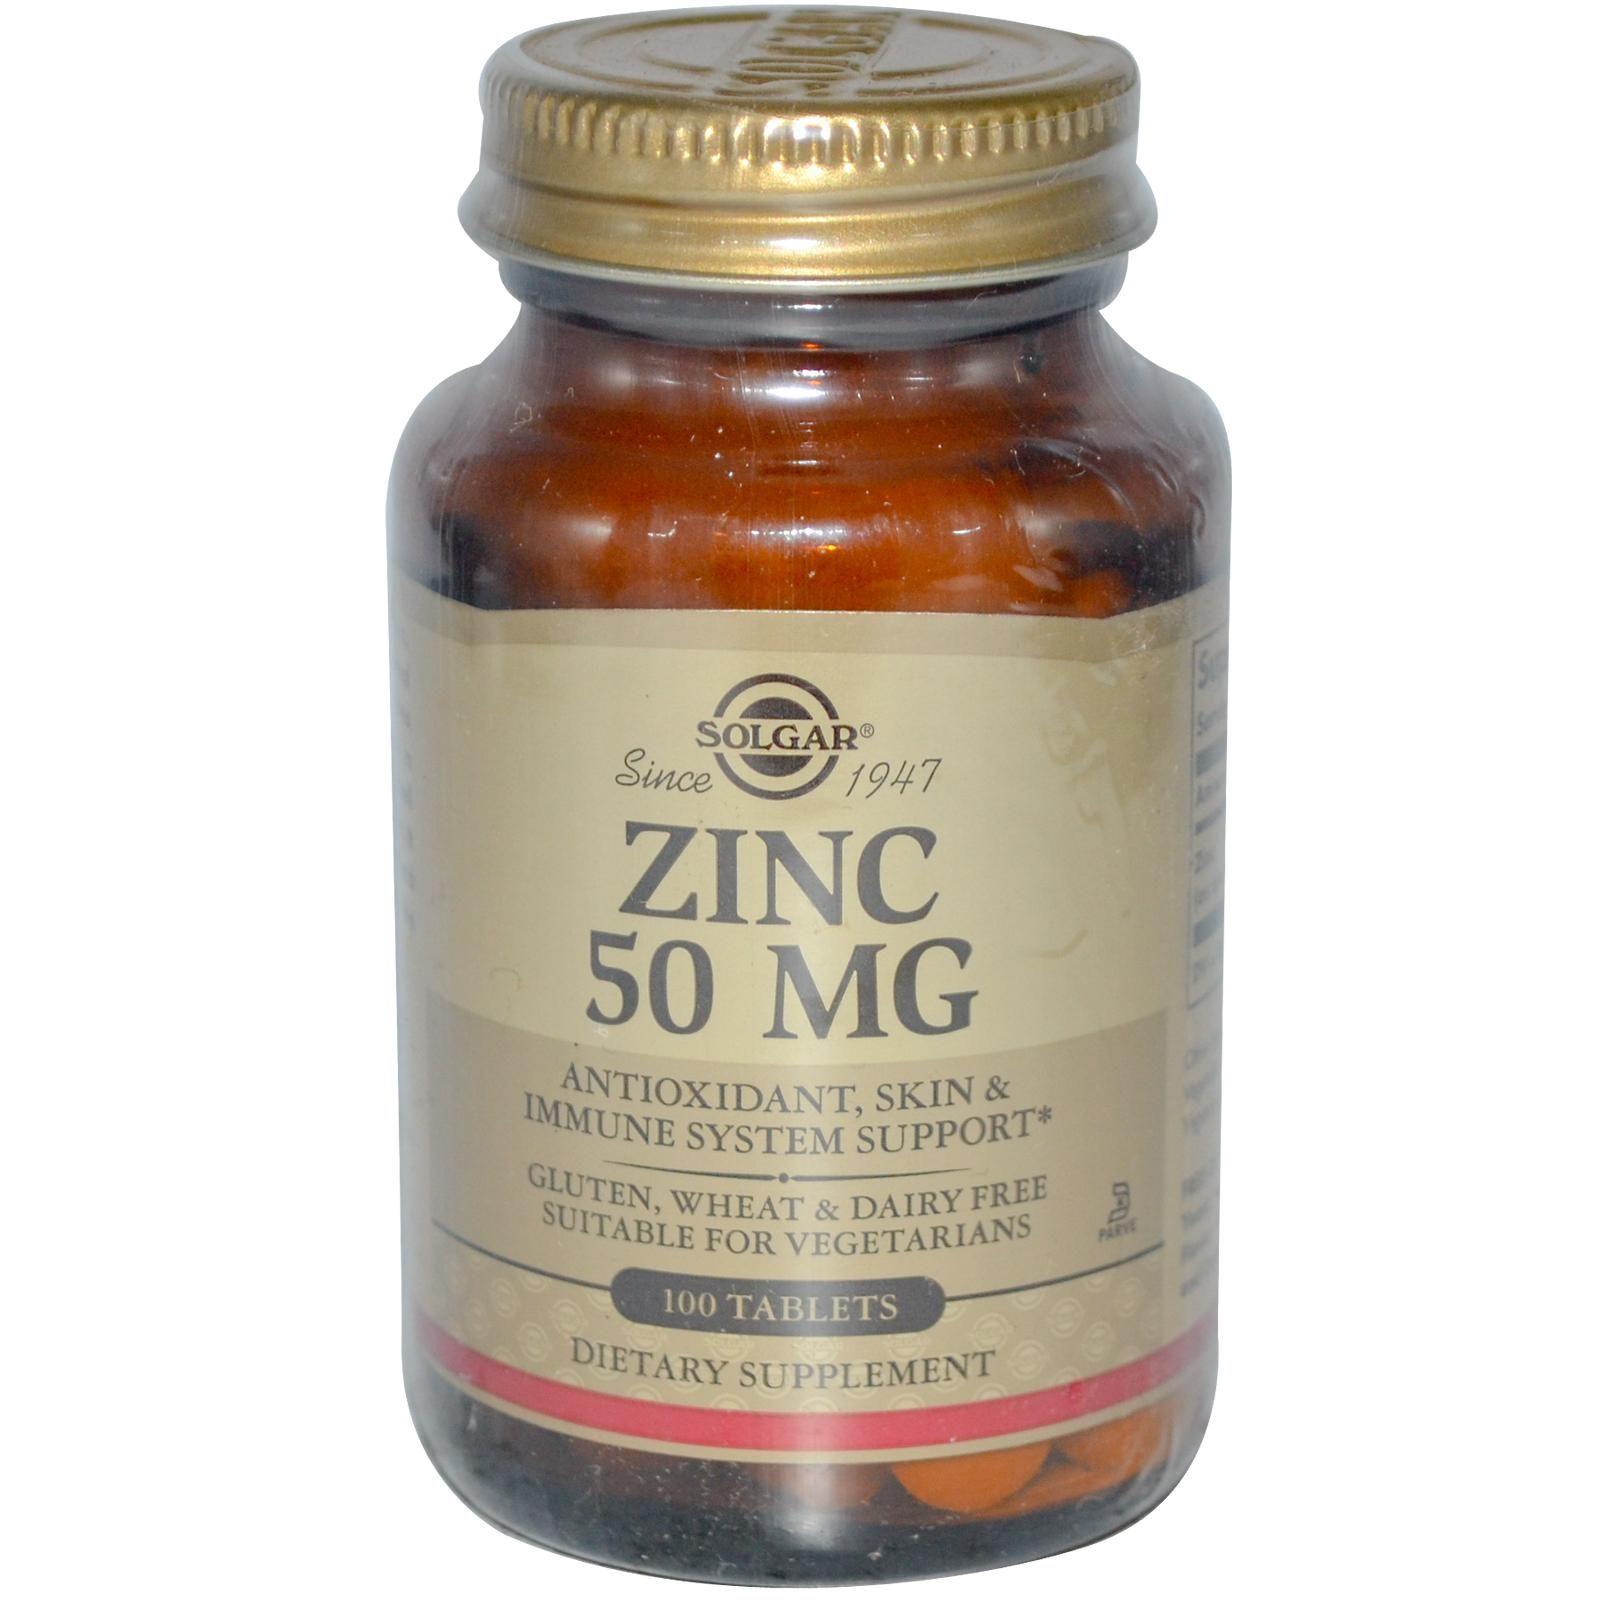 Solgar, Zinc, 50 mg, 100 Tablets Metabolism support